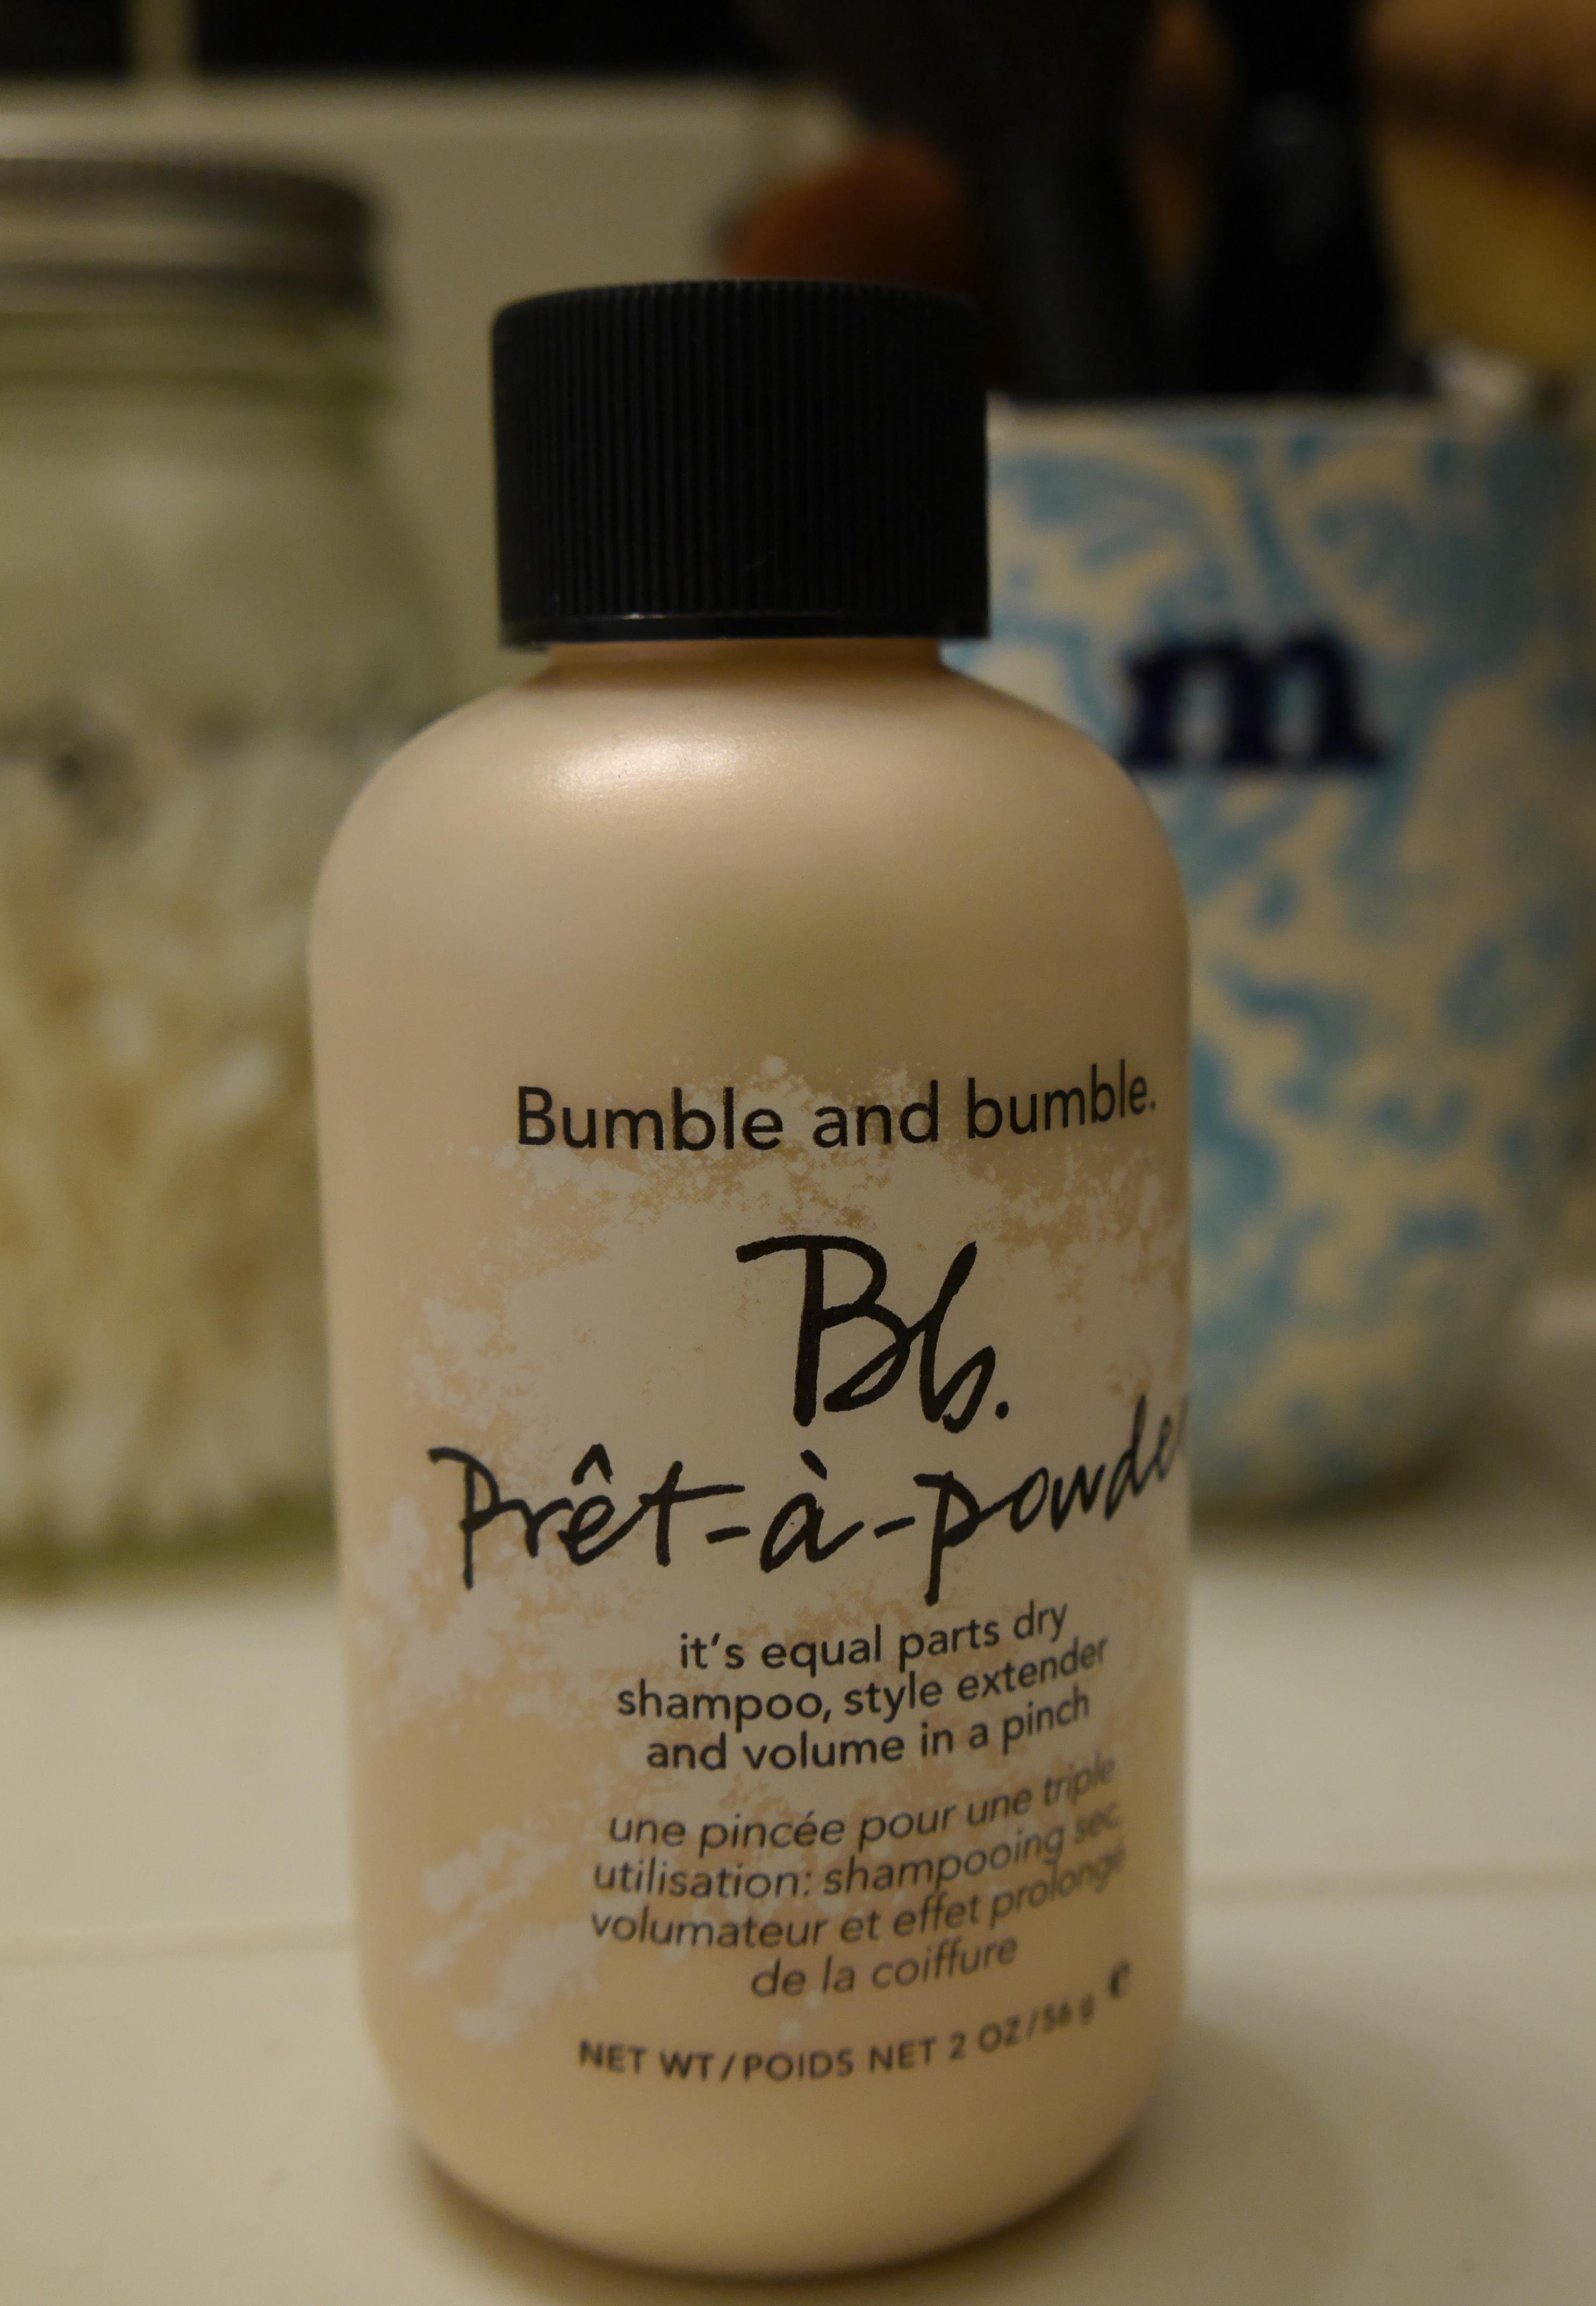 Bumble Bumble Pret A Powder Review Demo About That Big Hair